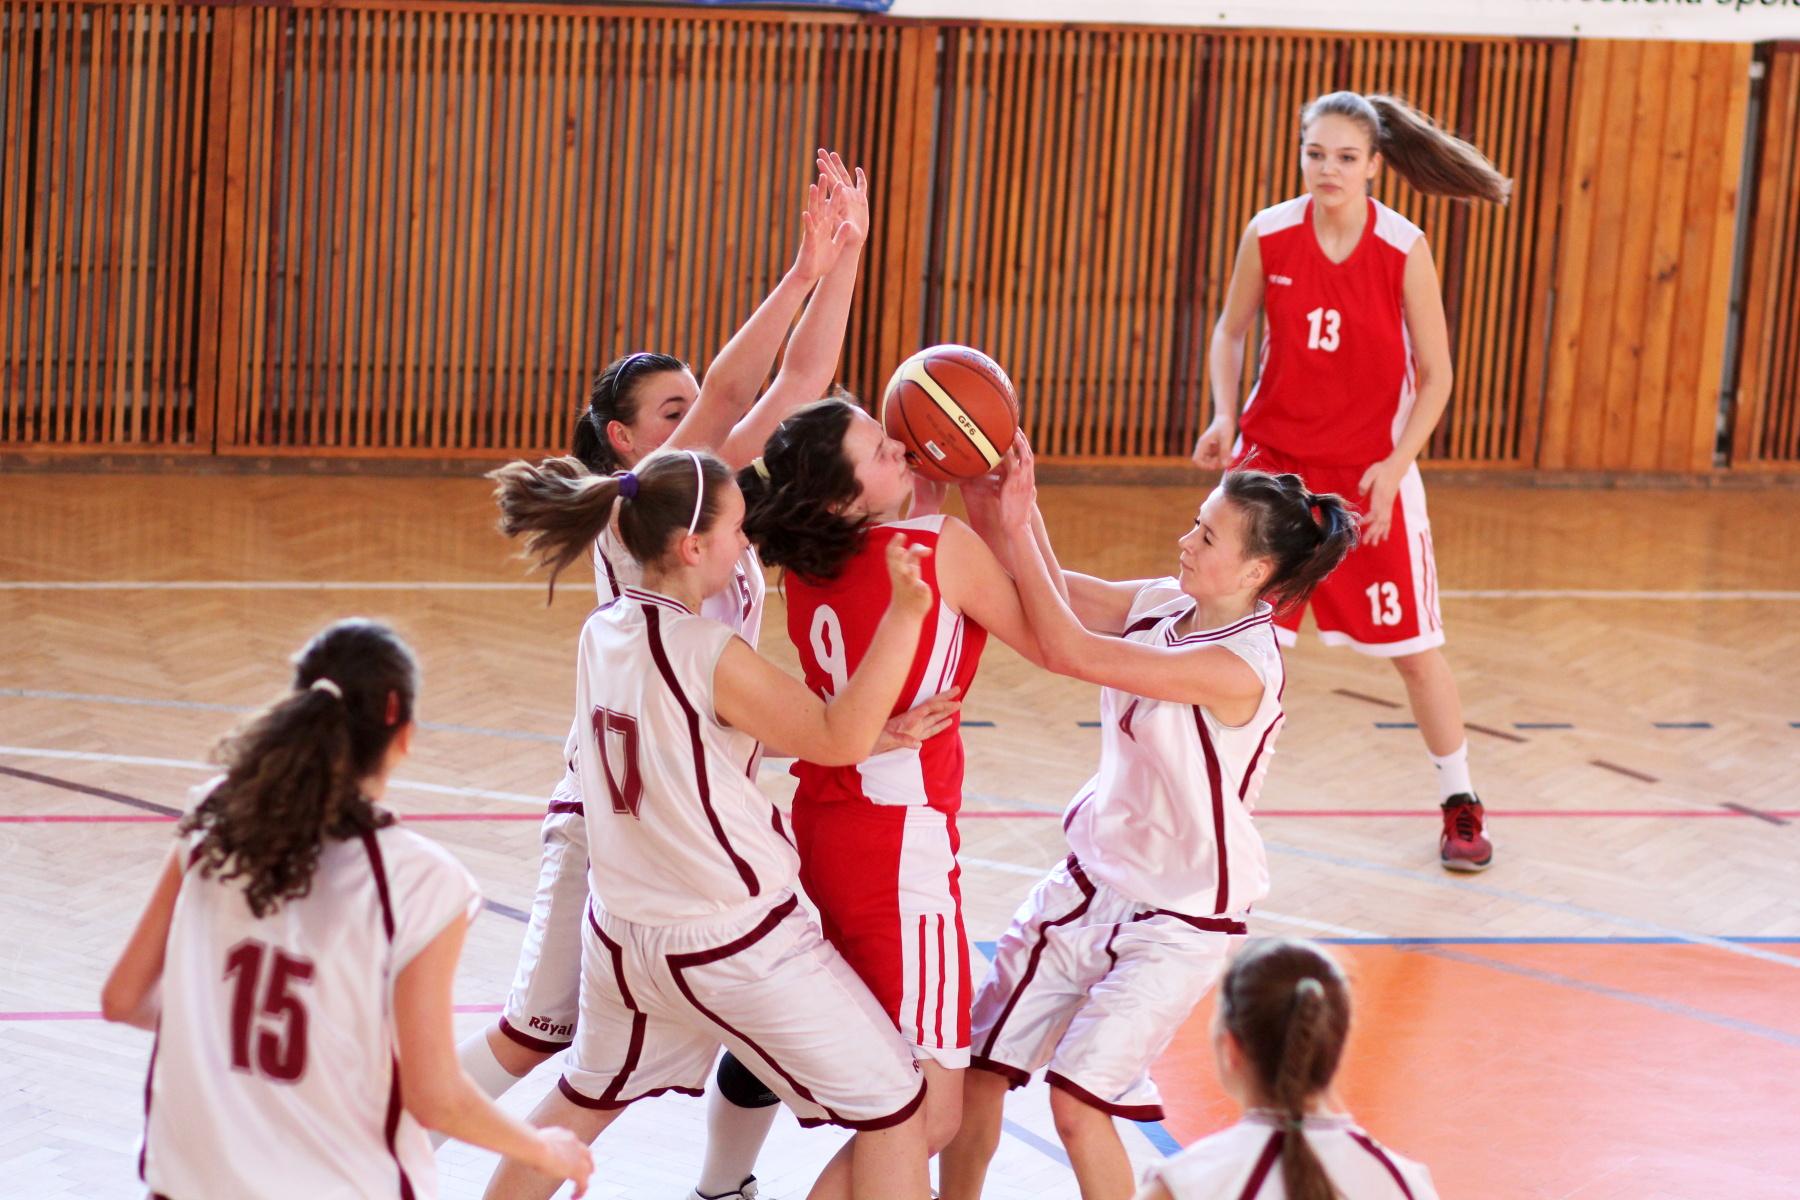 zvolen-bystrica-ziacky-basketbal-9